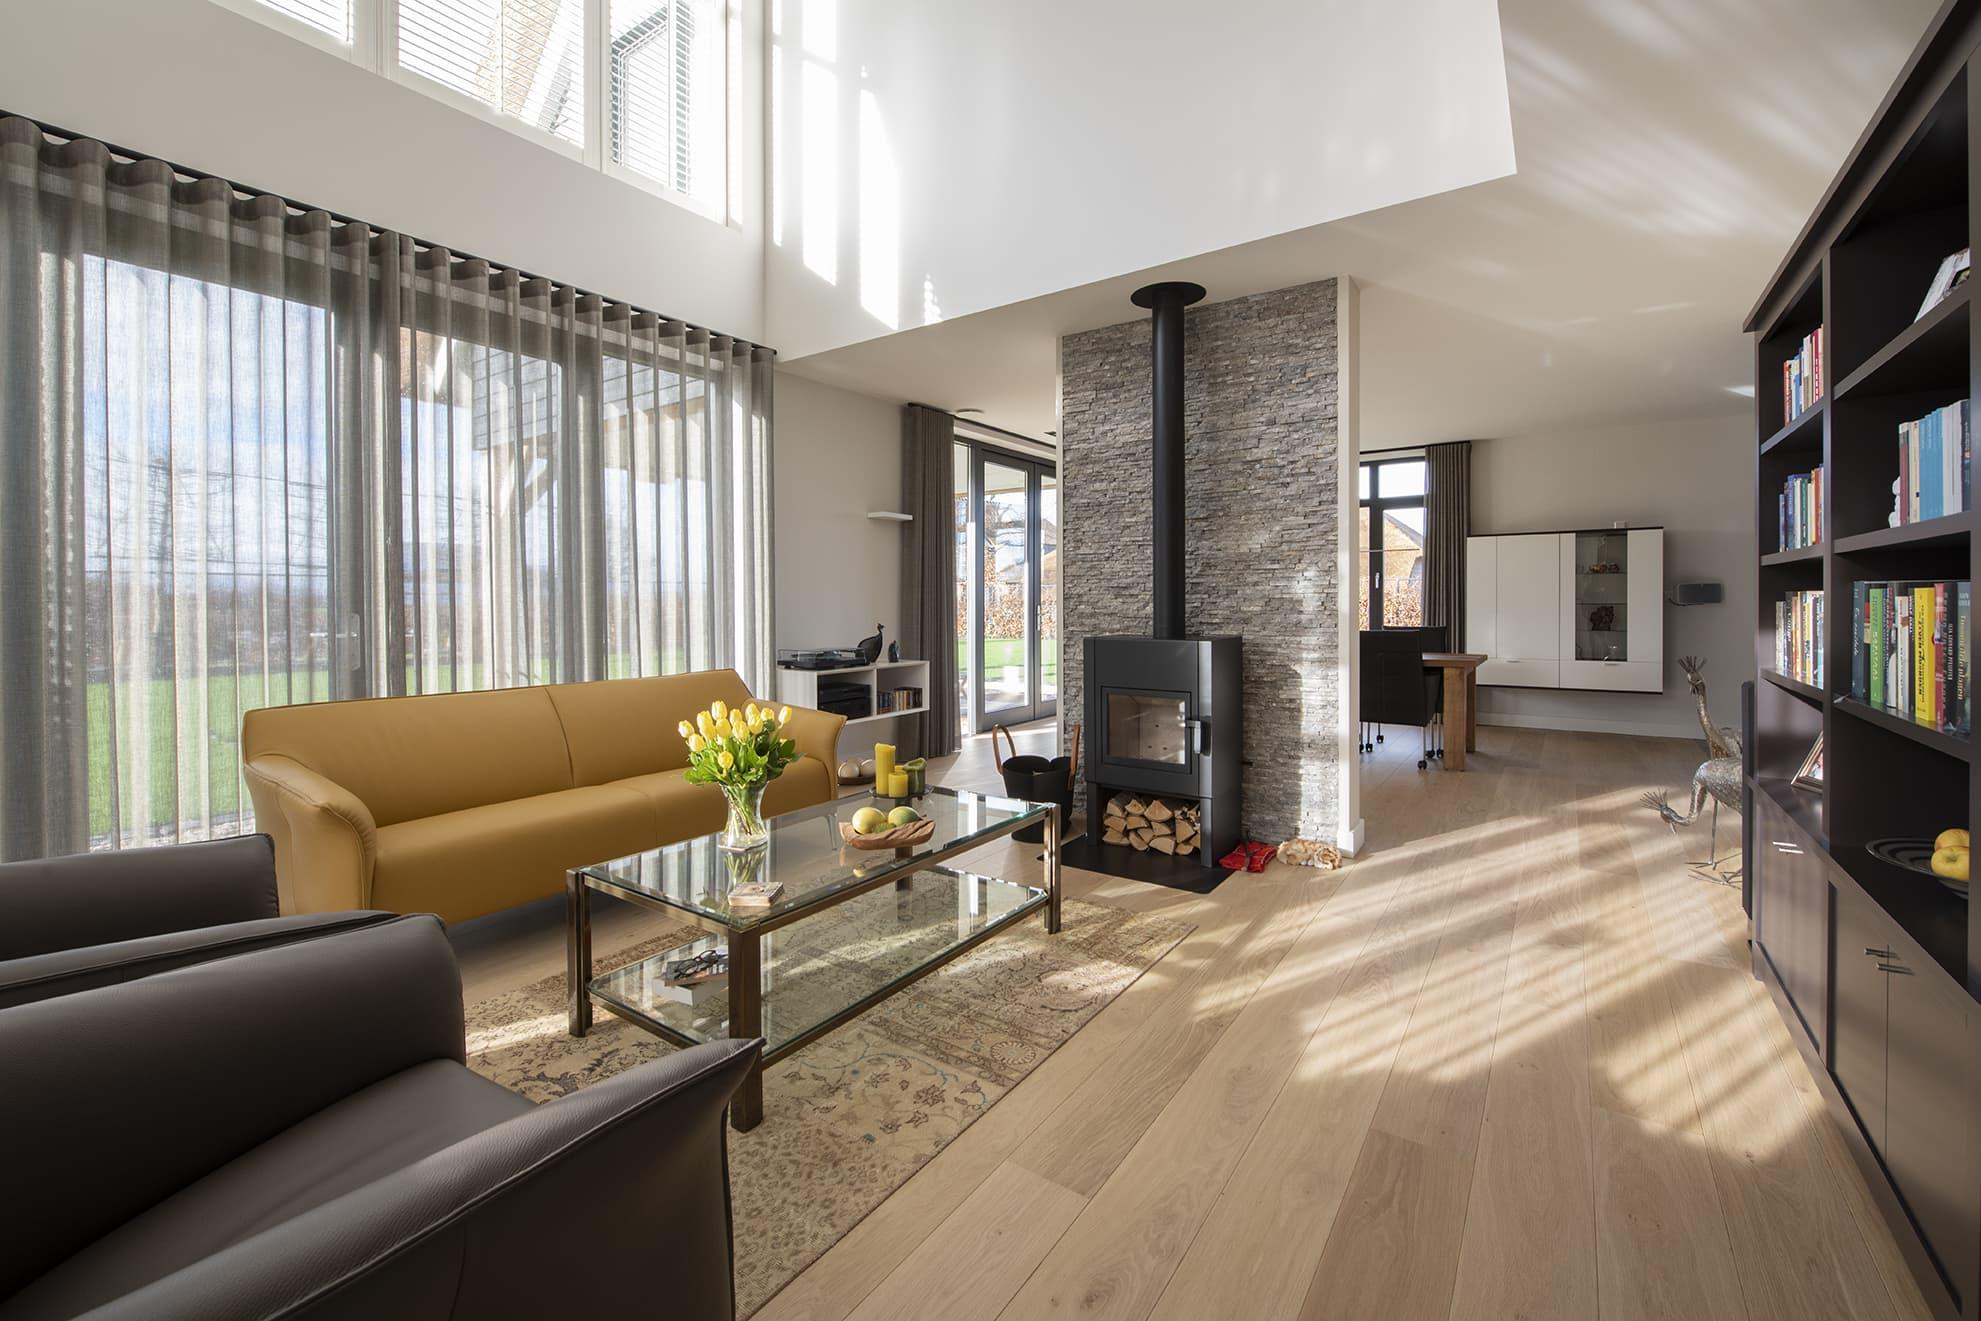 Warme rustige parketvloer in ruime lichte villa